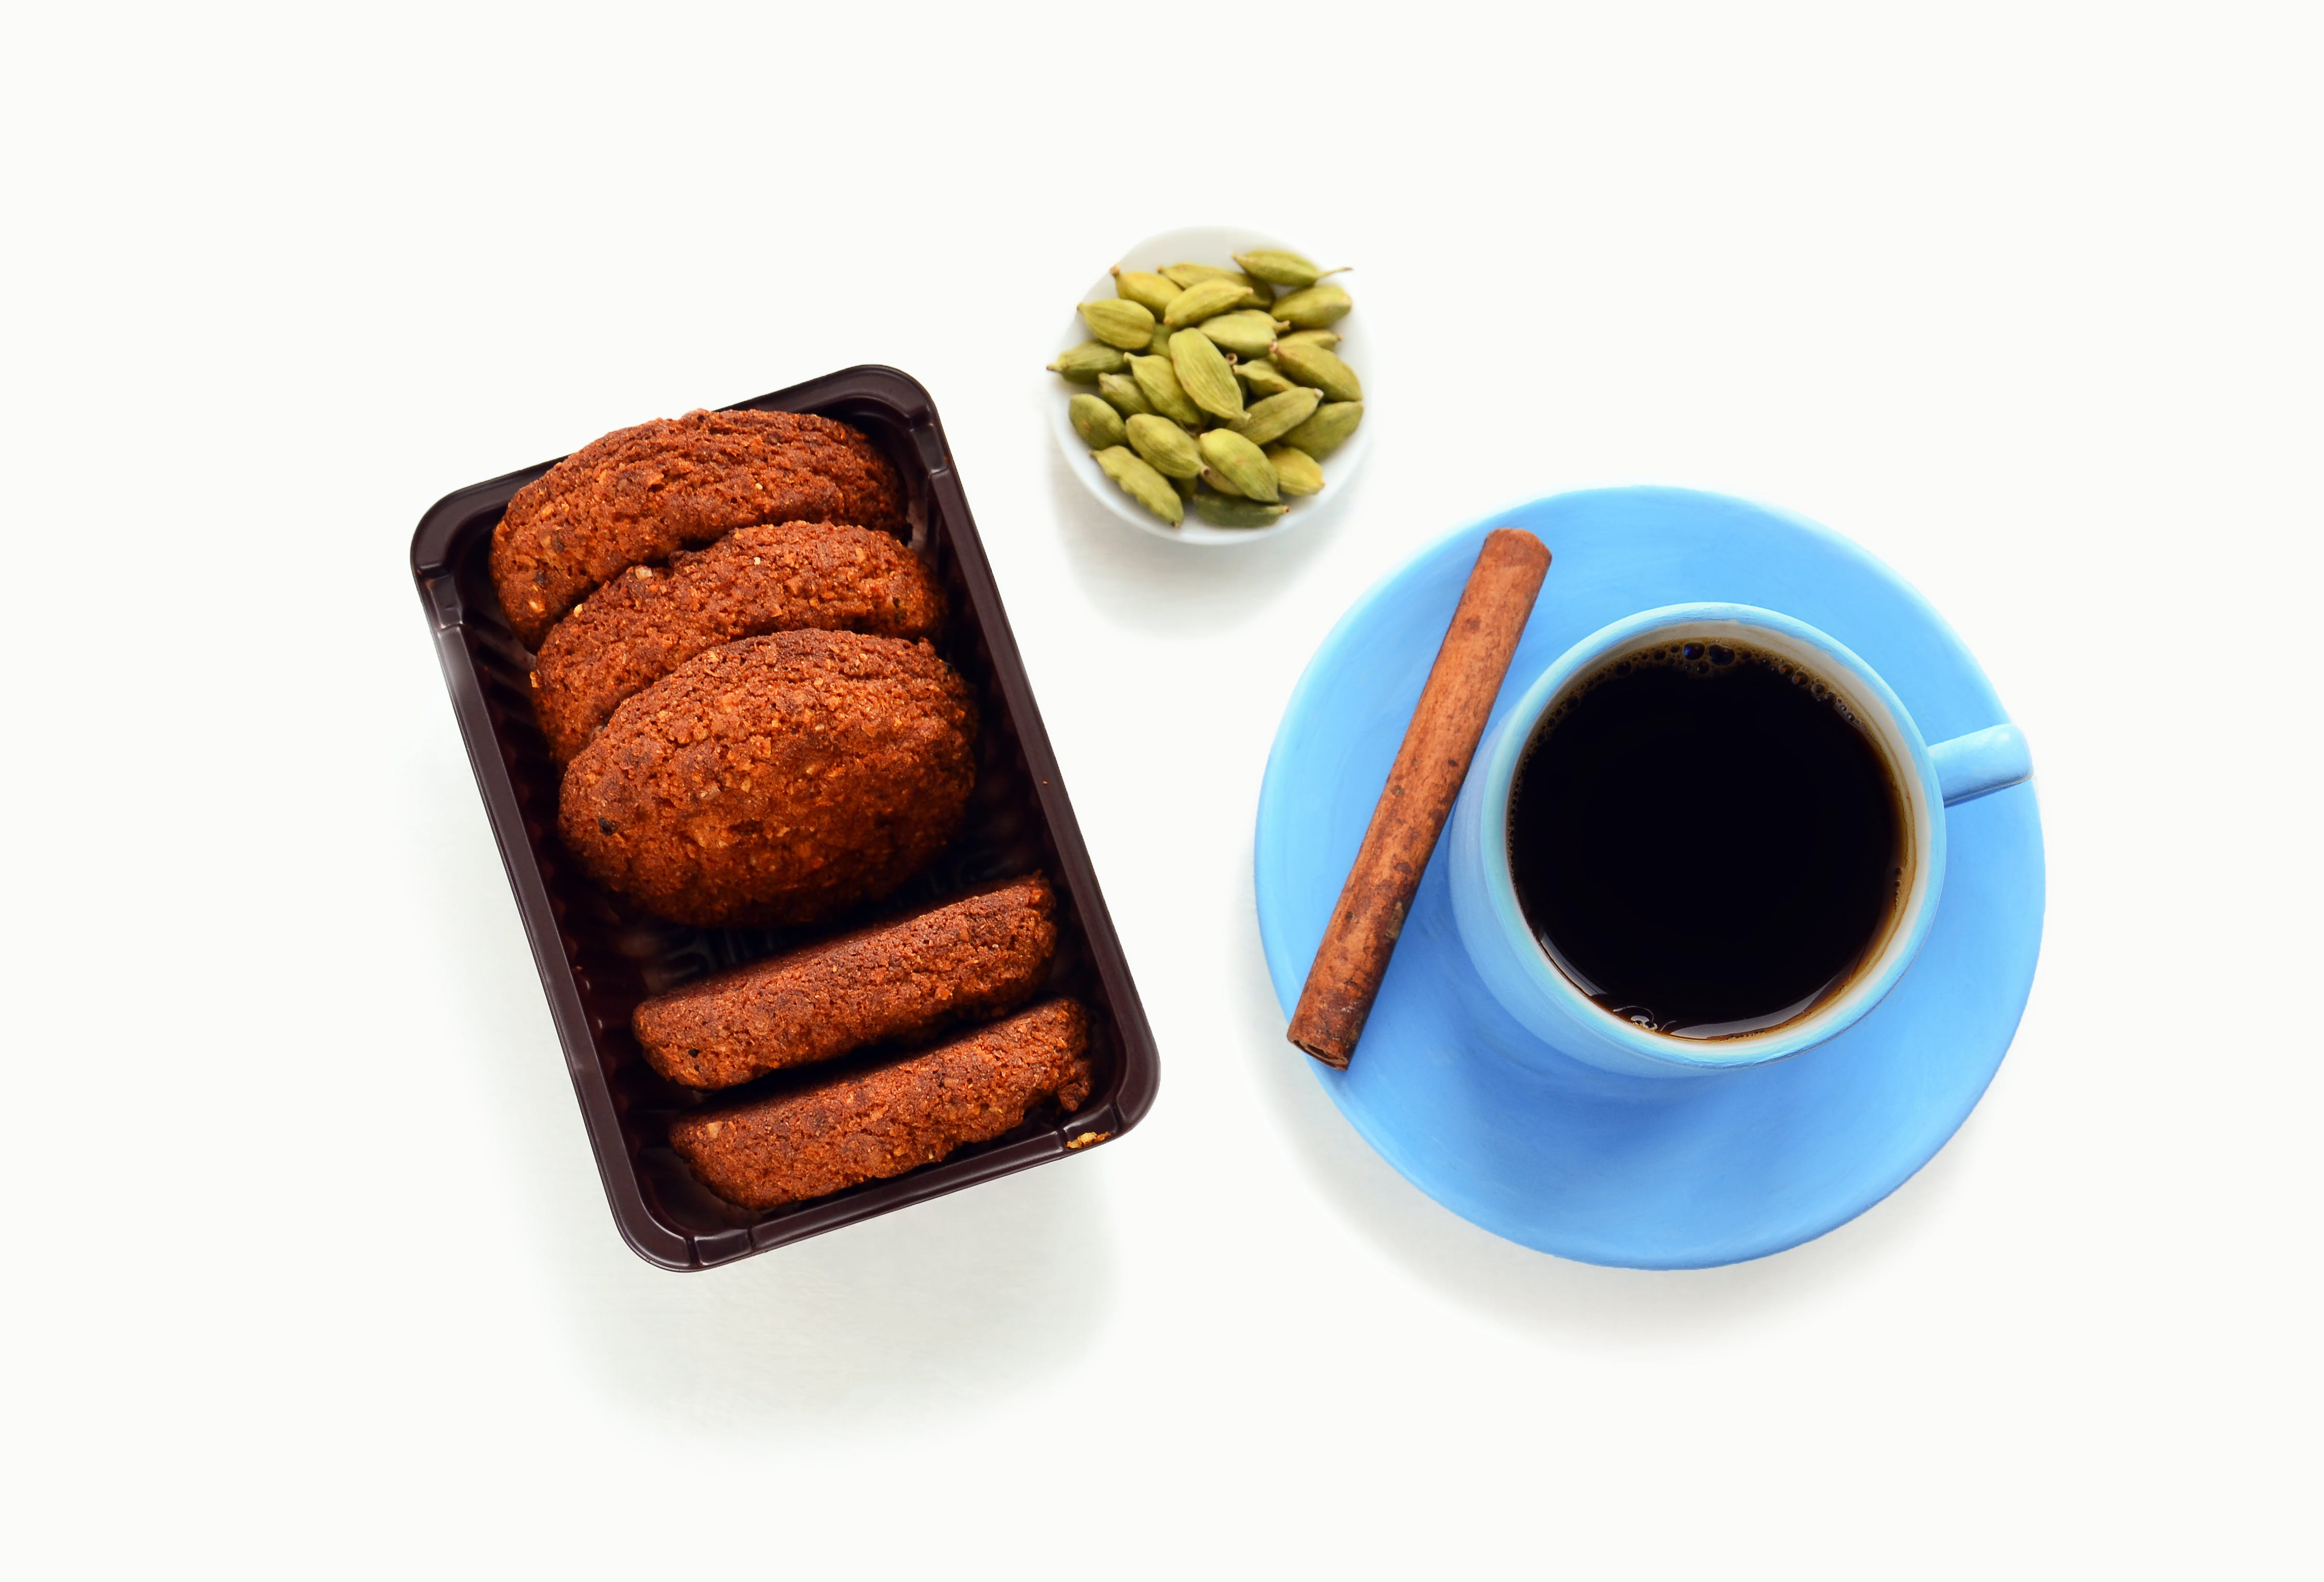 Kostenloses Stock Foto zu becher, essen, frühstück, gebäck